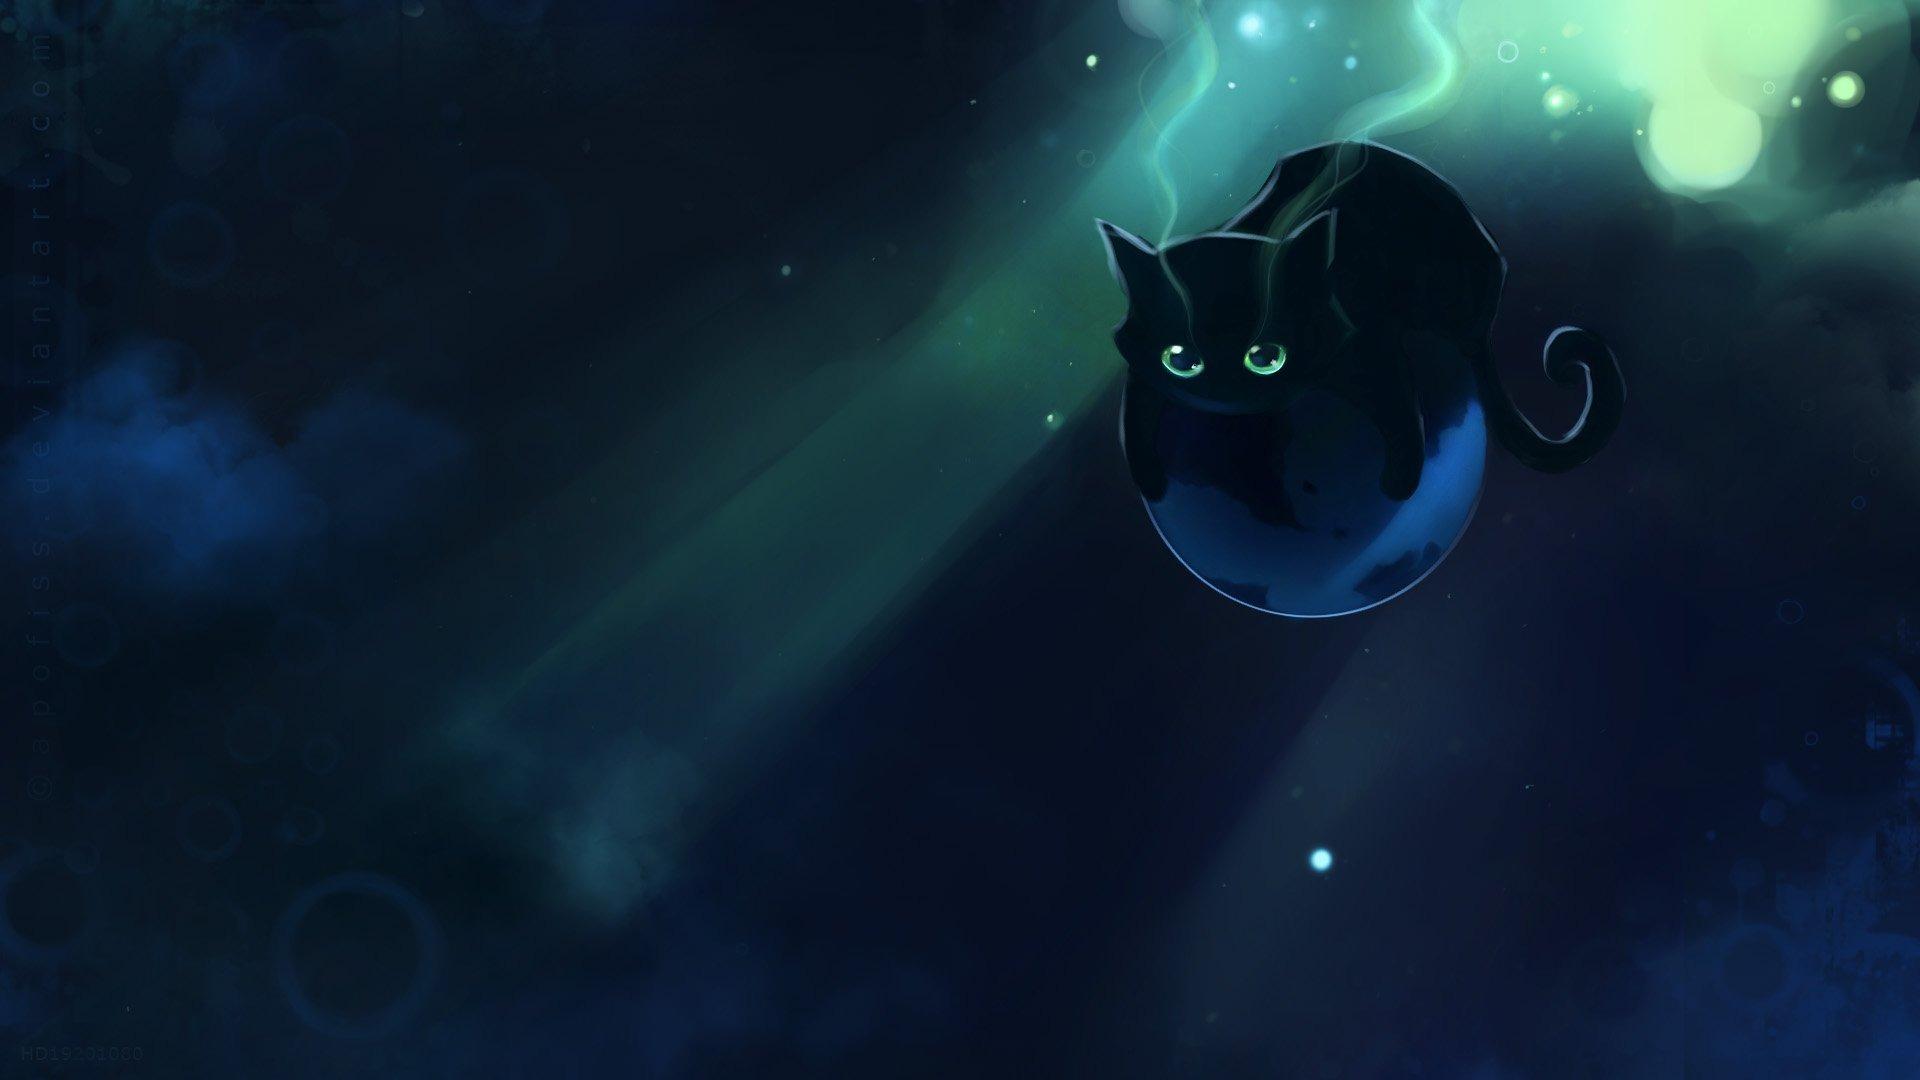 Apofiss-small-black-cat-watercolor-illustrations-1920x1080-wallpaper-wp3602642